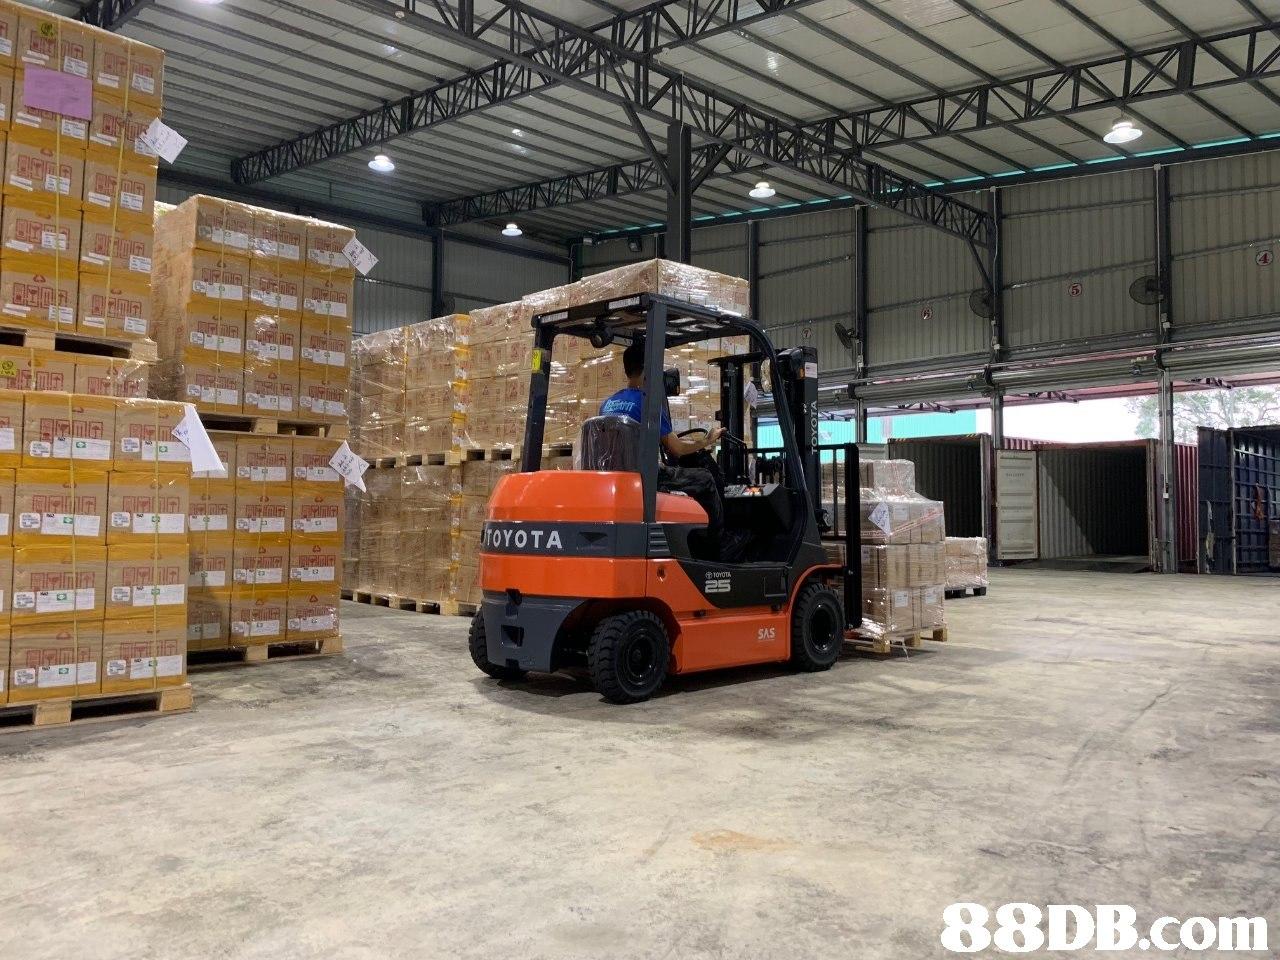 OYOTA ⑦TOYOTA SAS   transport,forklift truck,motor vehicle,warehouse,commercial vehicle